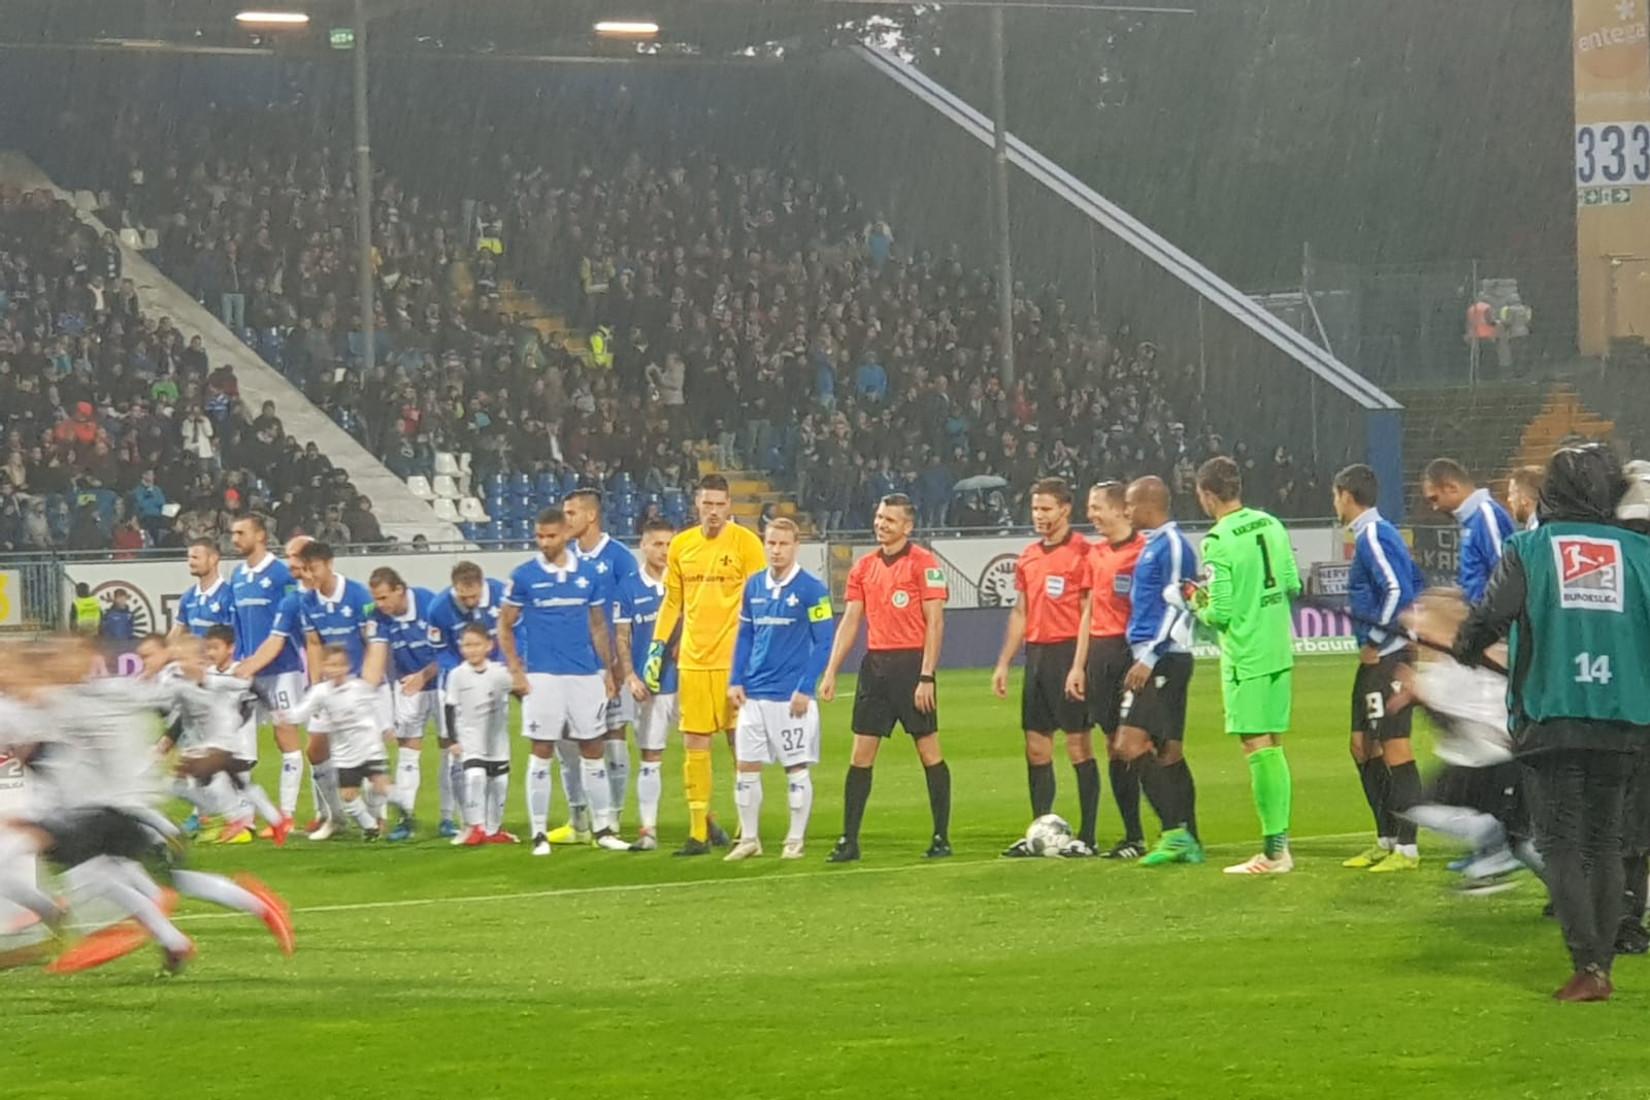 SV Darmstadt 98 – Karlsruher SC 1:1 (1:1)